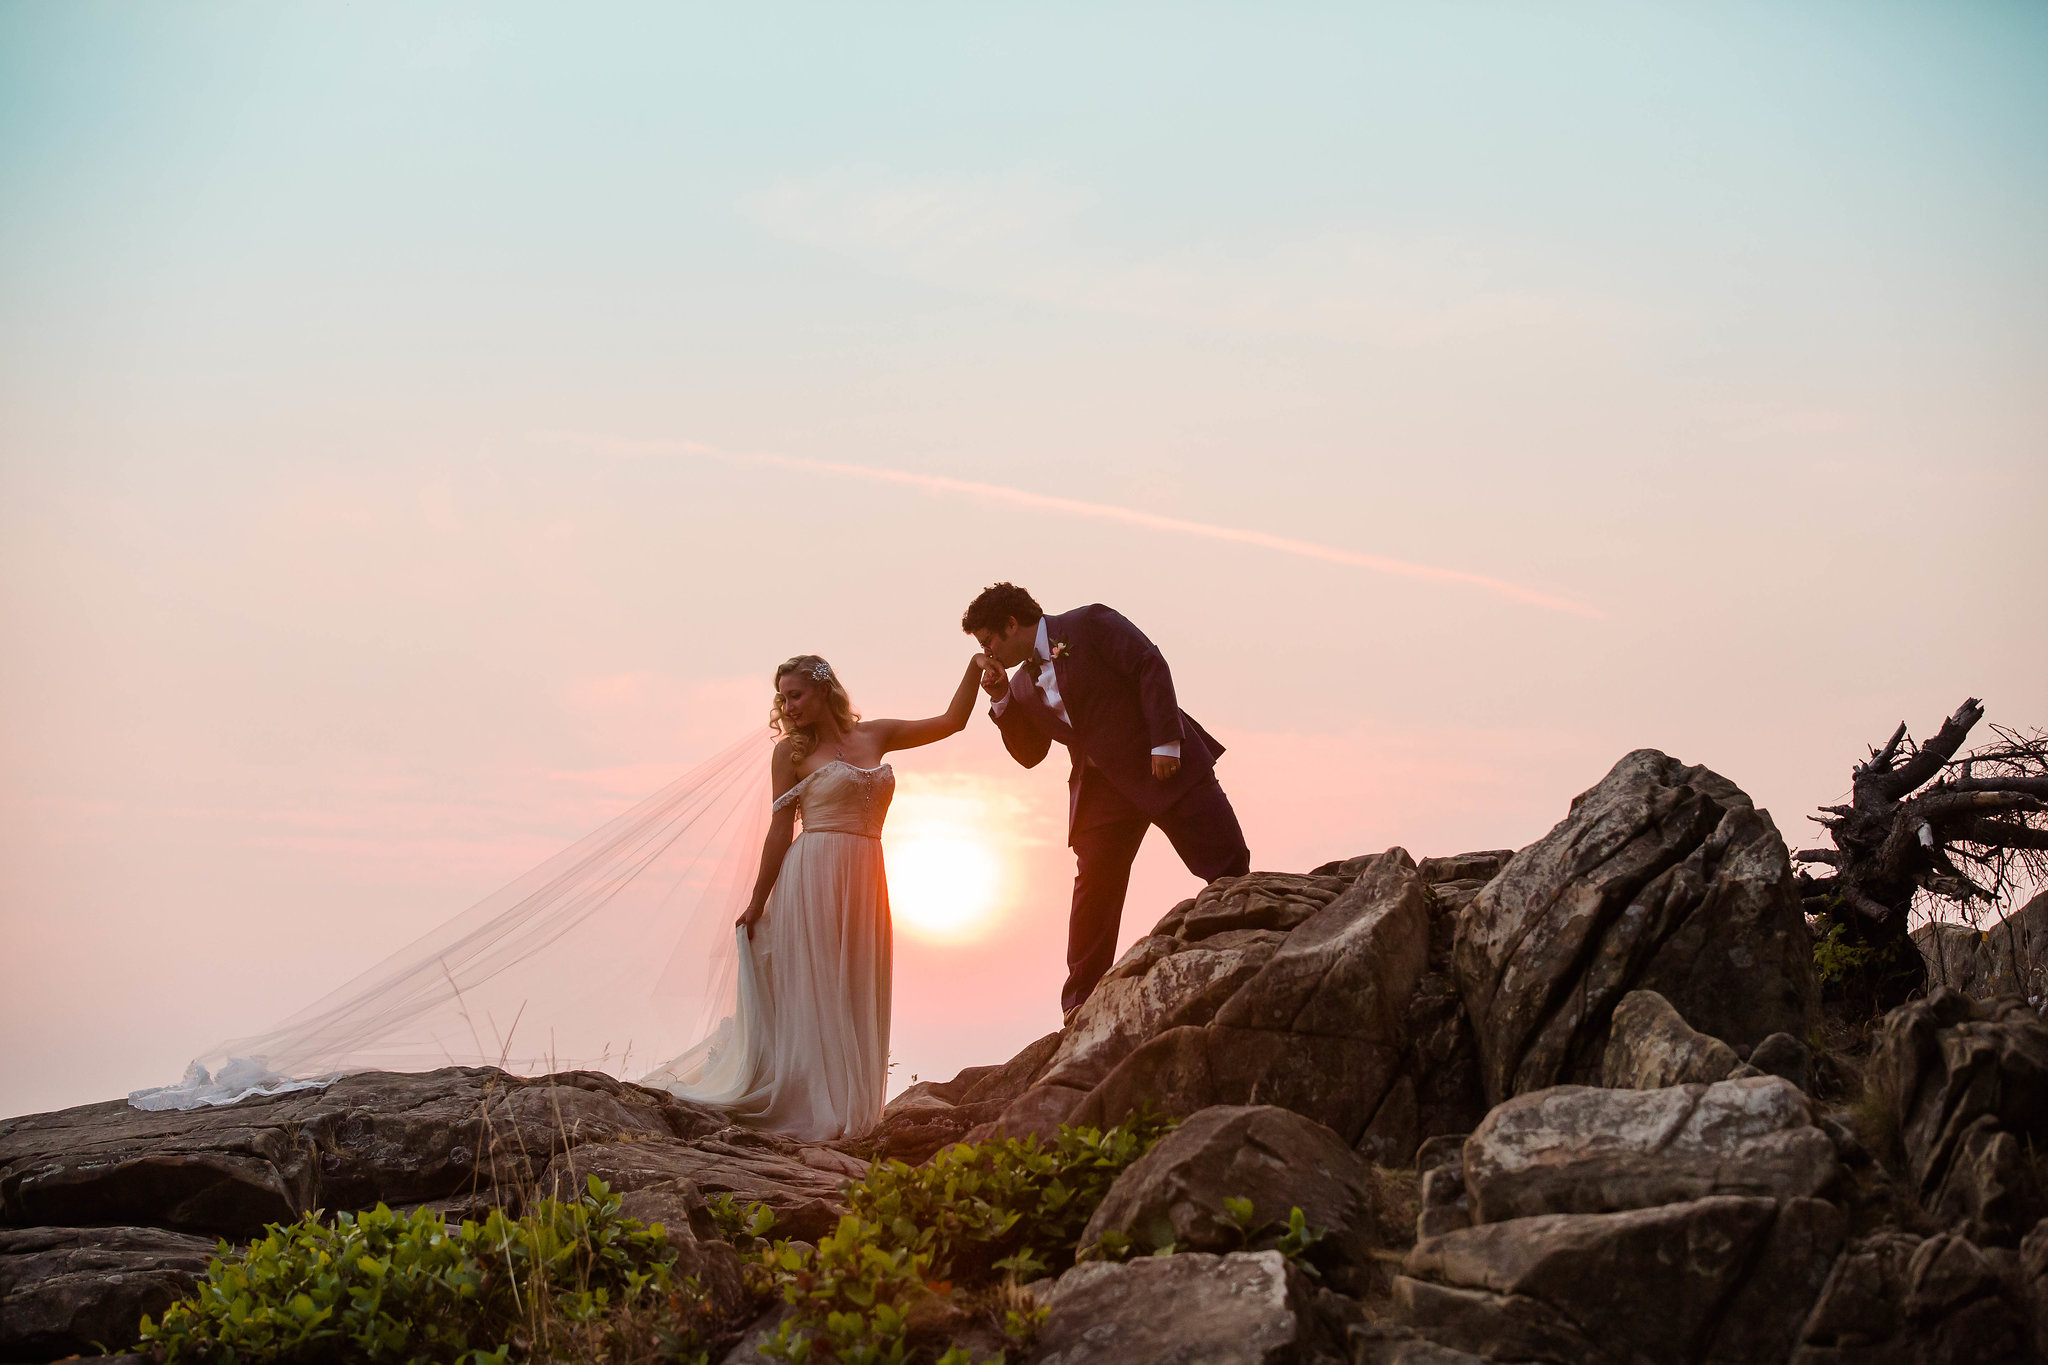 bellingham-wedding-backayard-by-seattle-wedding-photographer-adina-preston-35.jpg